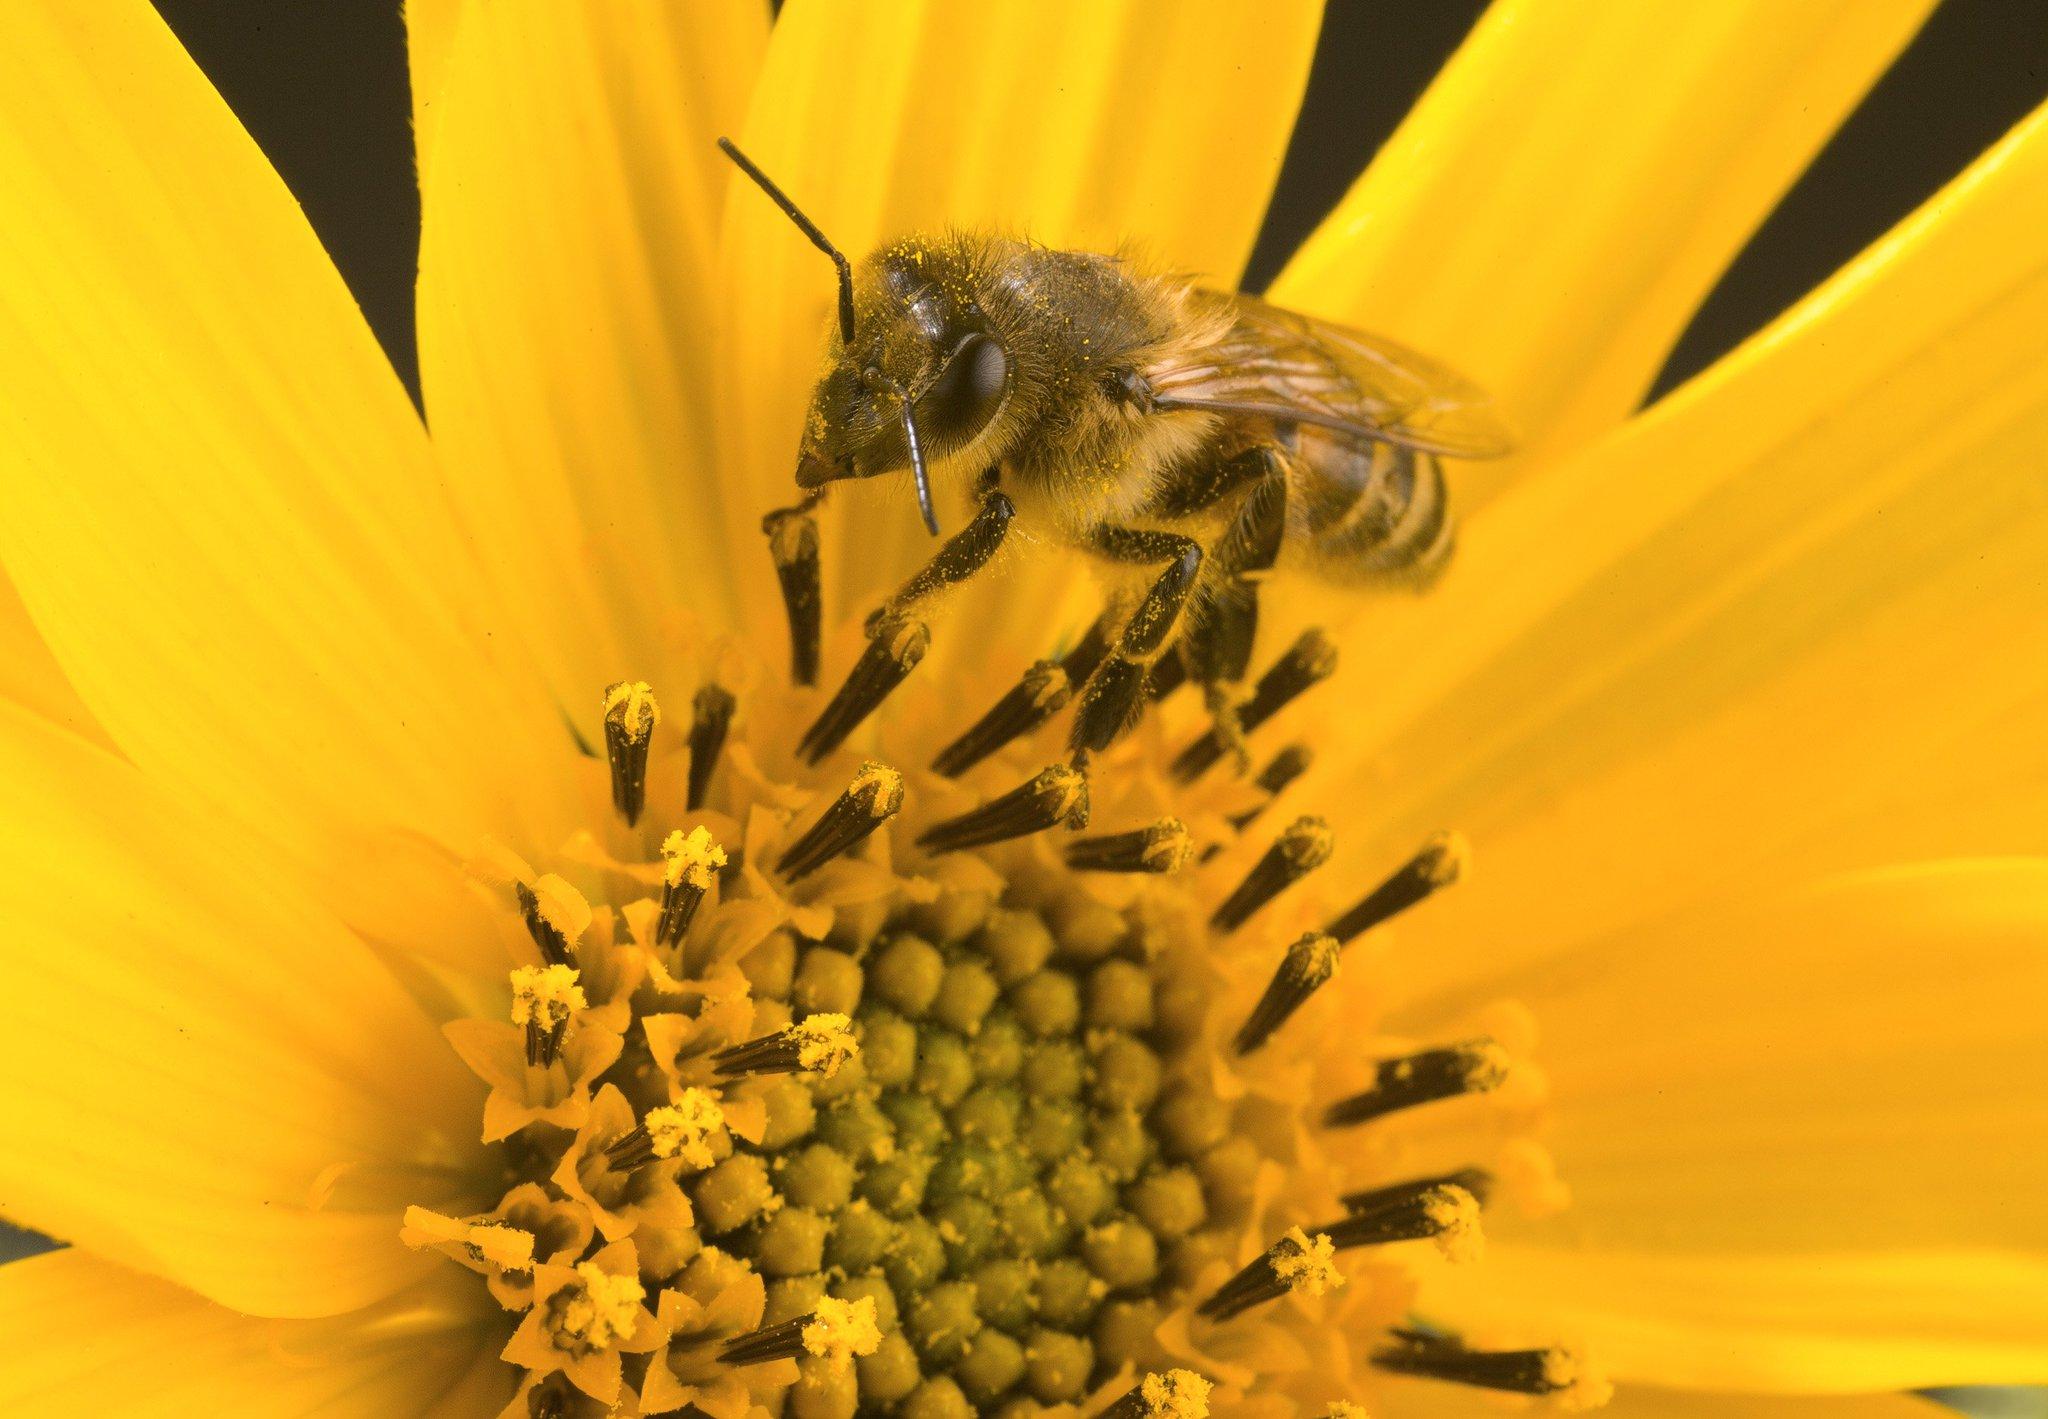 Honey Bee Colonies More Successful by Foraging on Non-Crop Fields https://t.co/6L6OSC2lj0 #HoneyBee https://t.co/SZMHtTHZF9